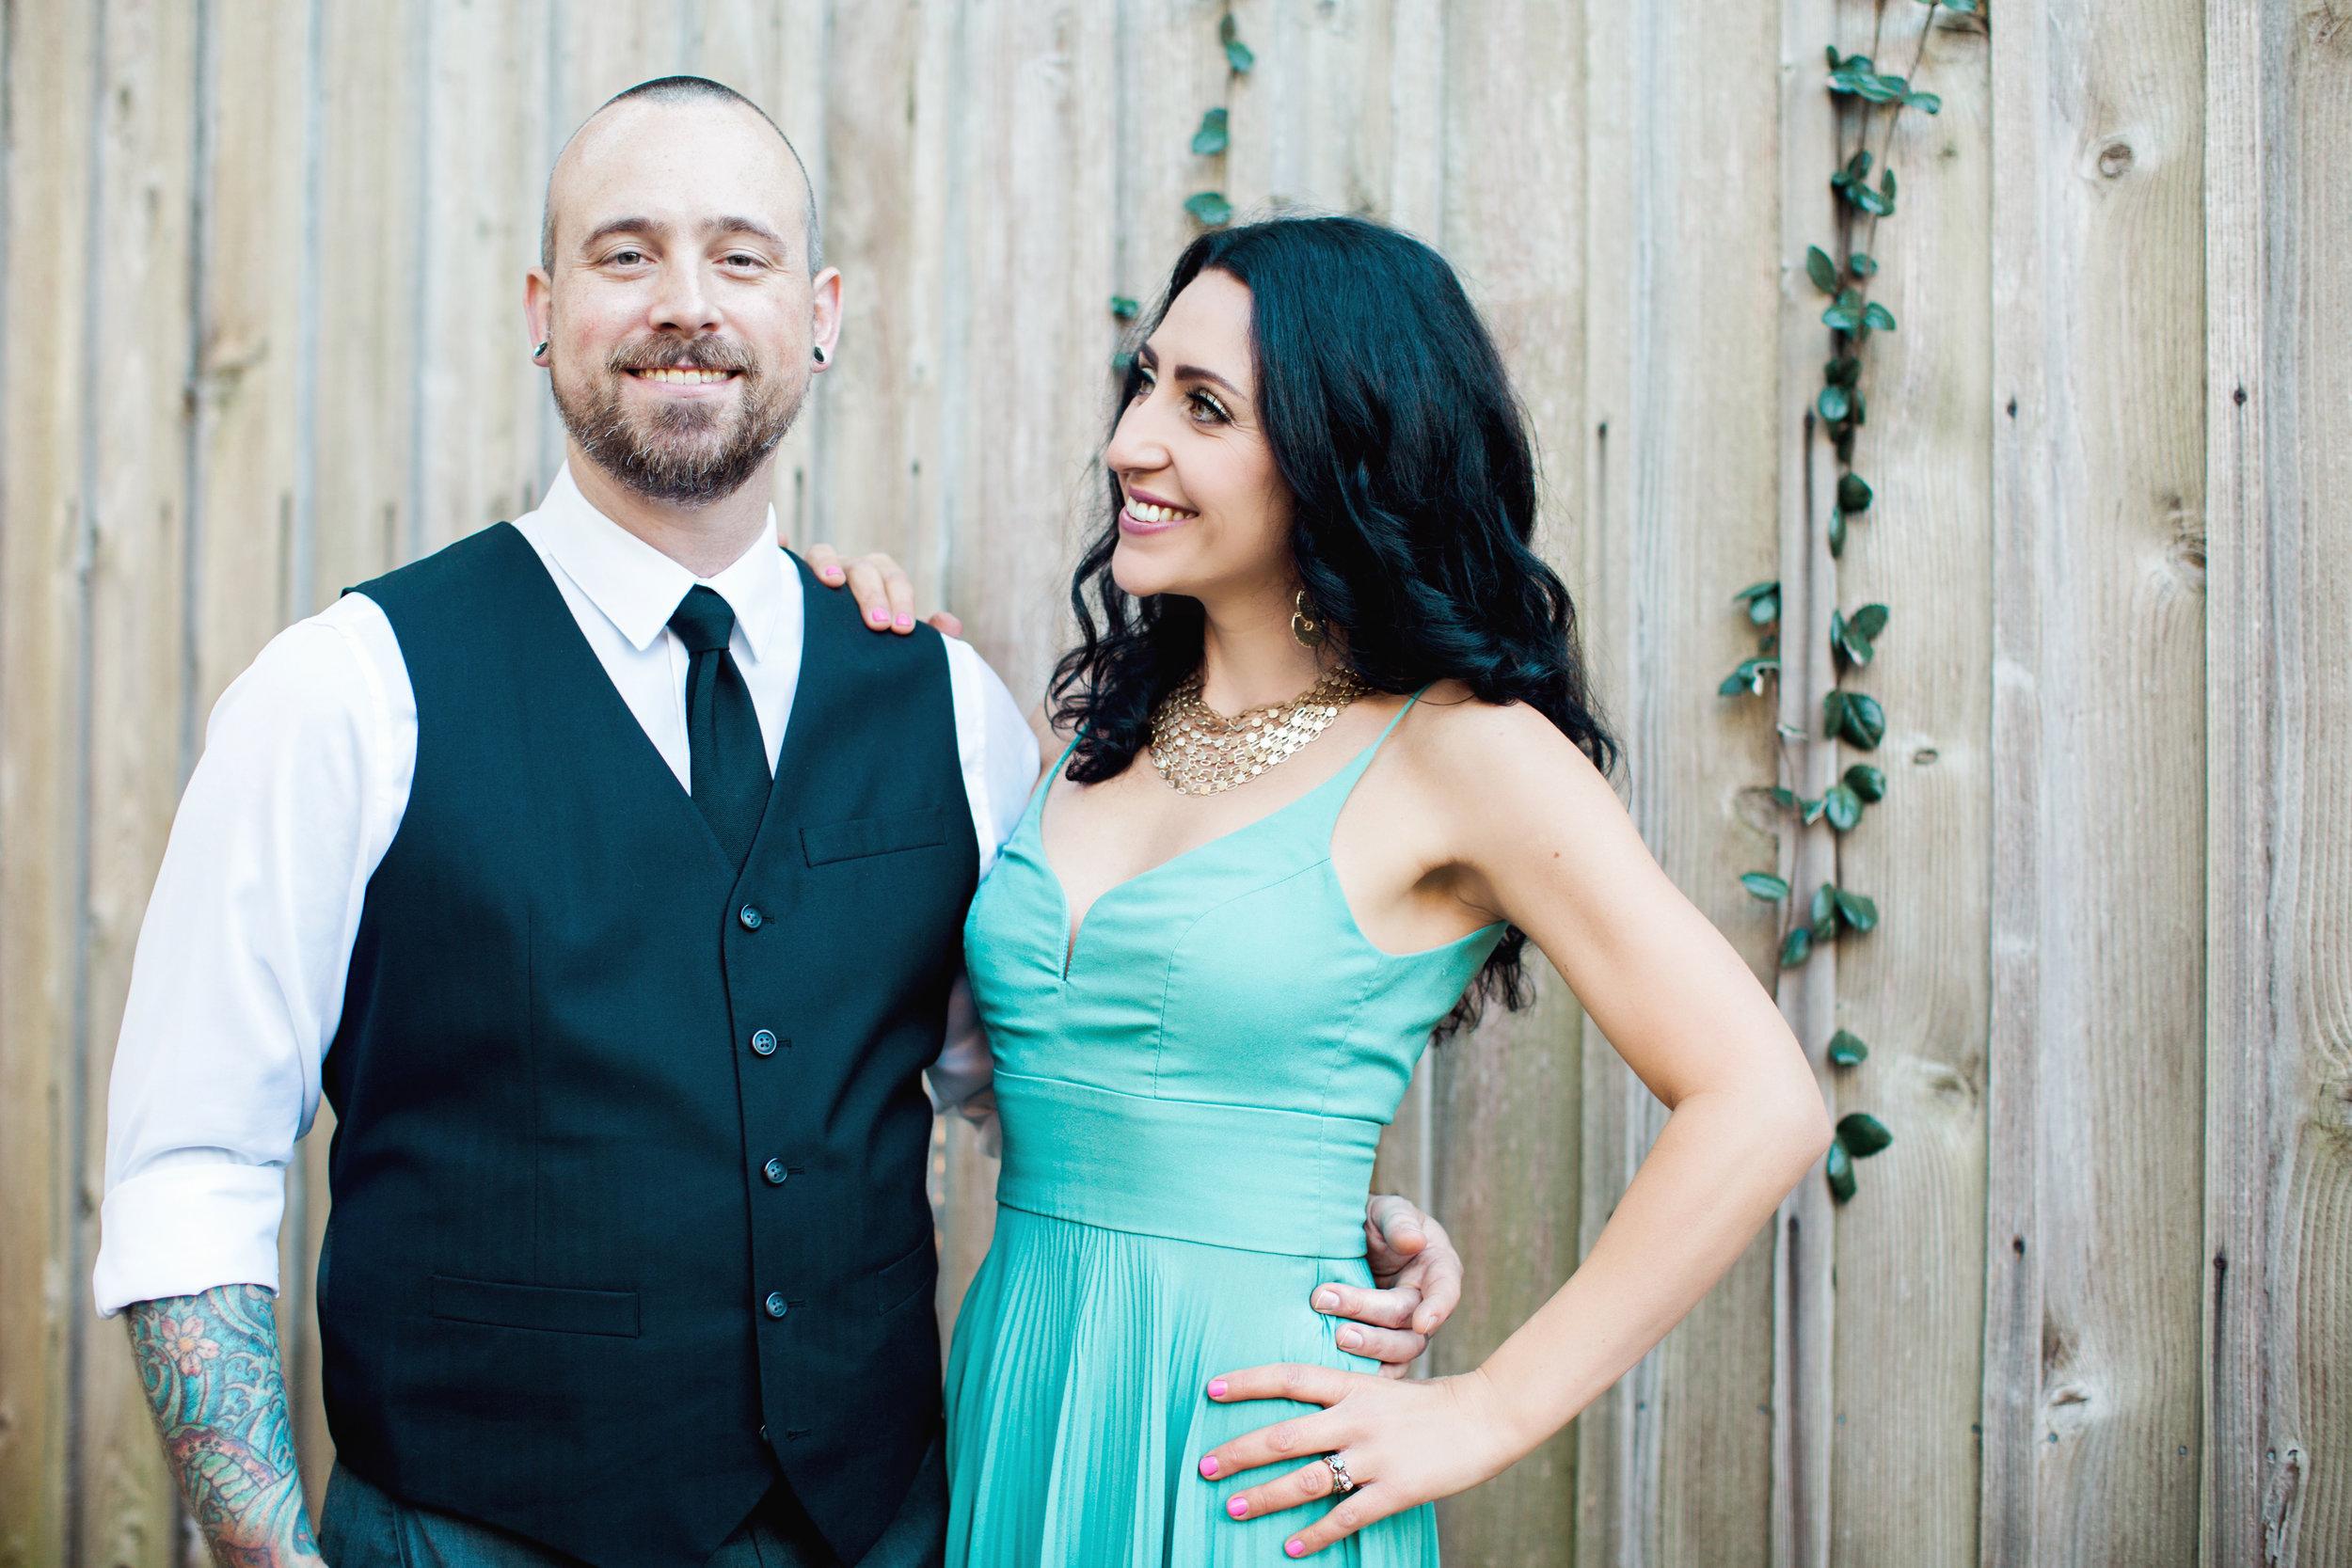 CindyGiovagnoliPhotography_Seattle_Washington_PNW_Couple_Engagement_Portrait_Photography-016.jpg